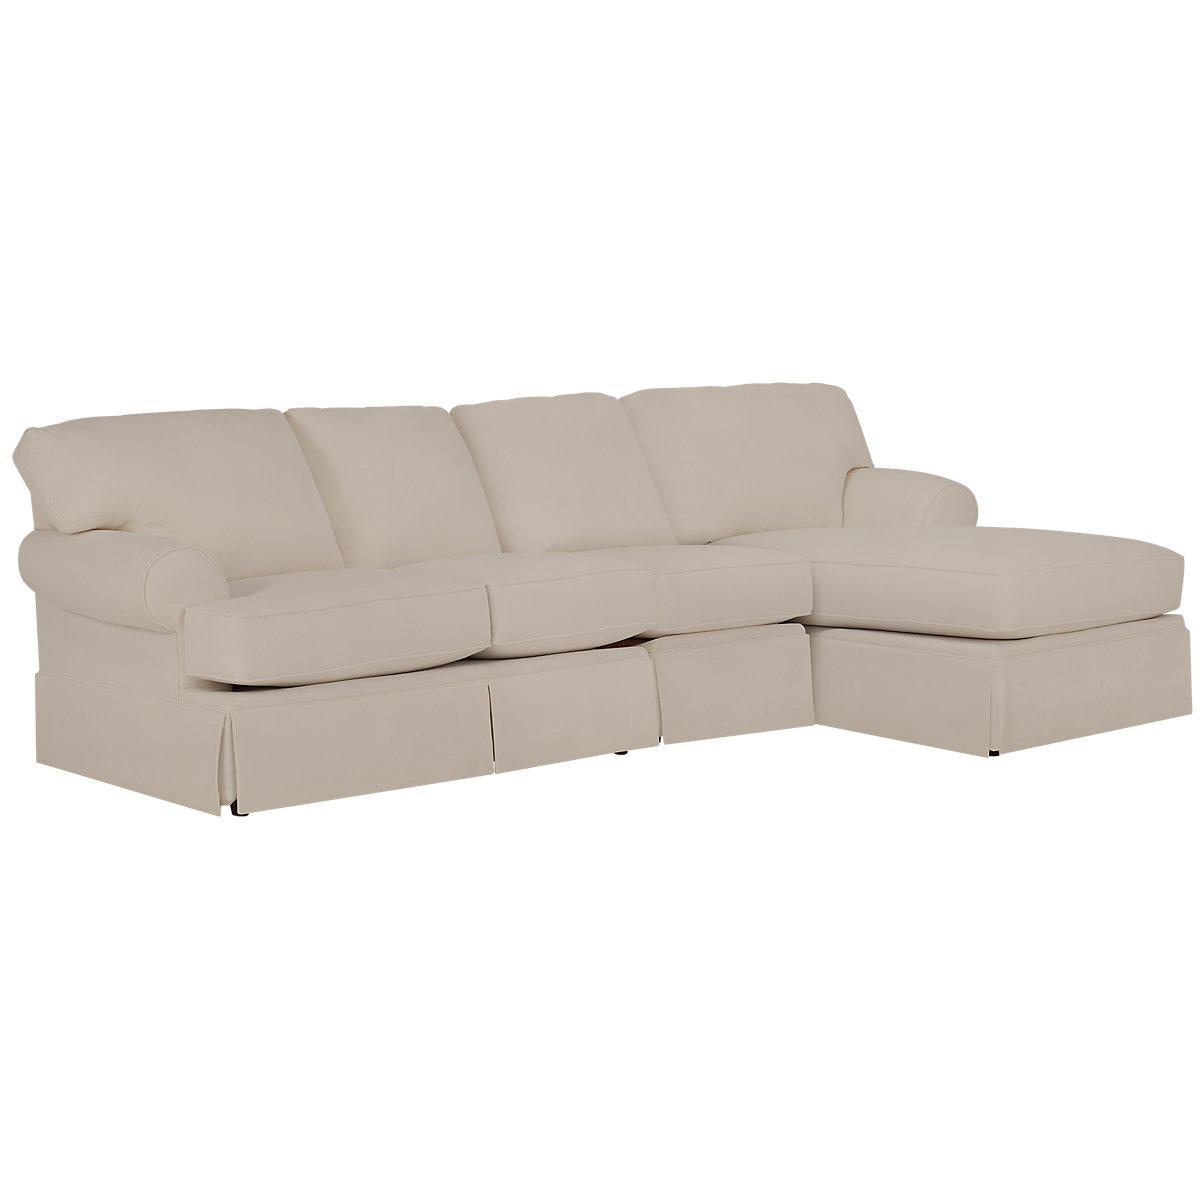 City furniture turner khaki fabric small right chaise for Chaise kaki